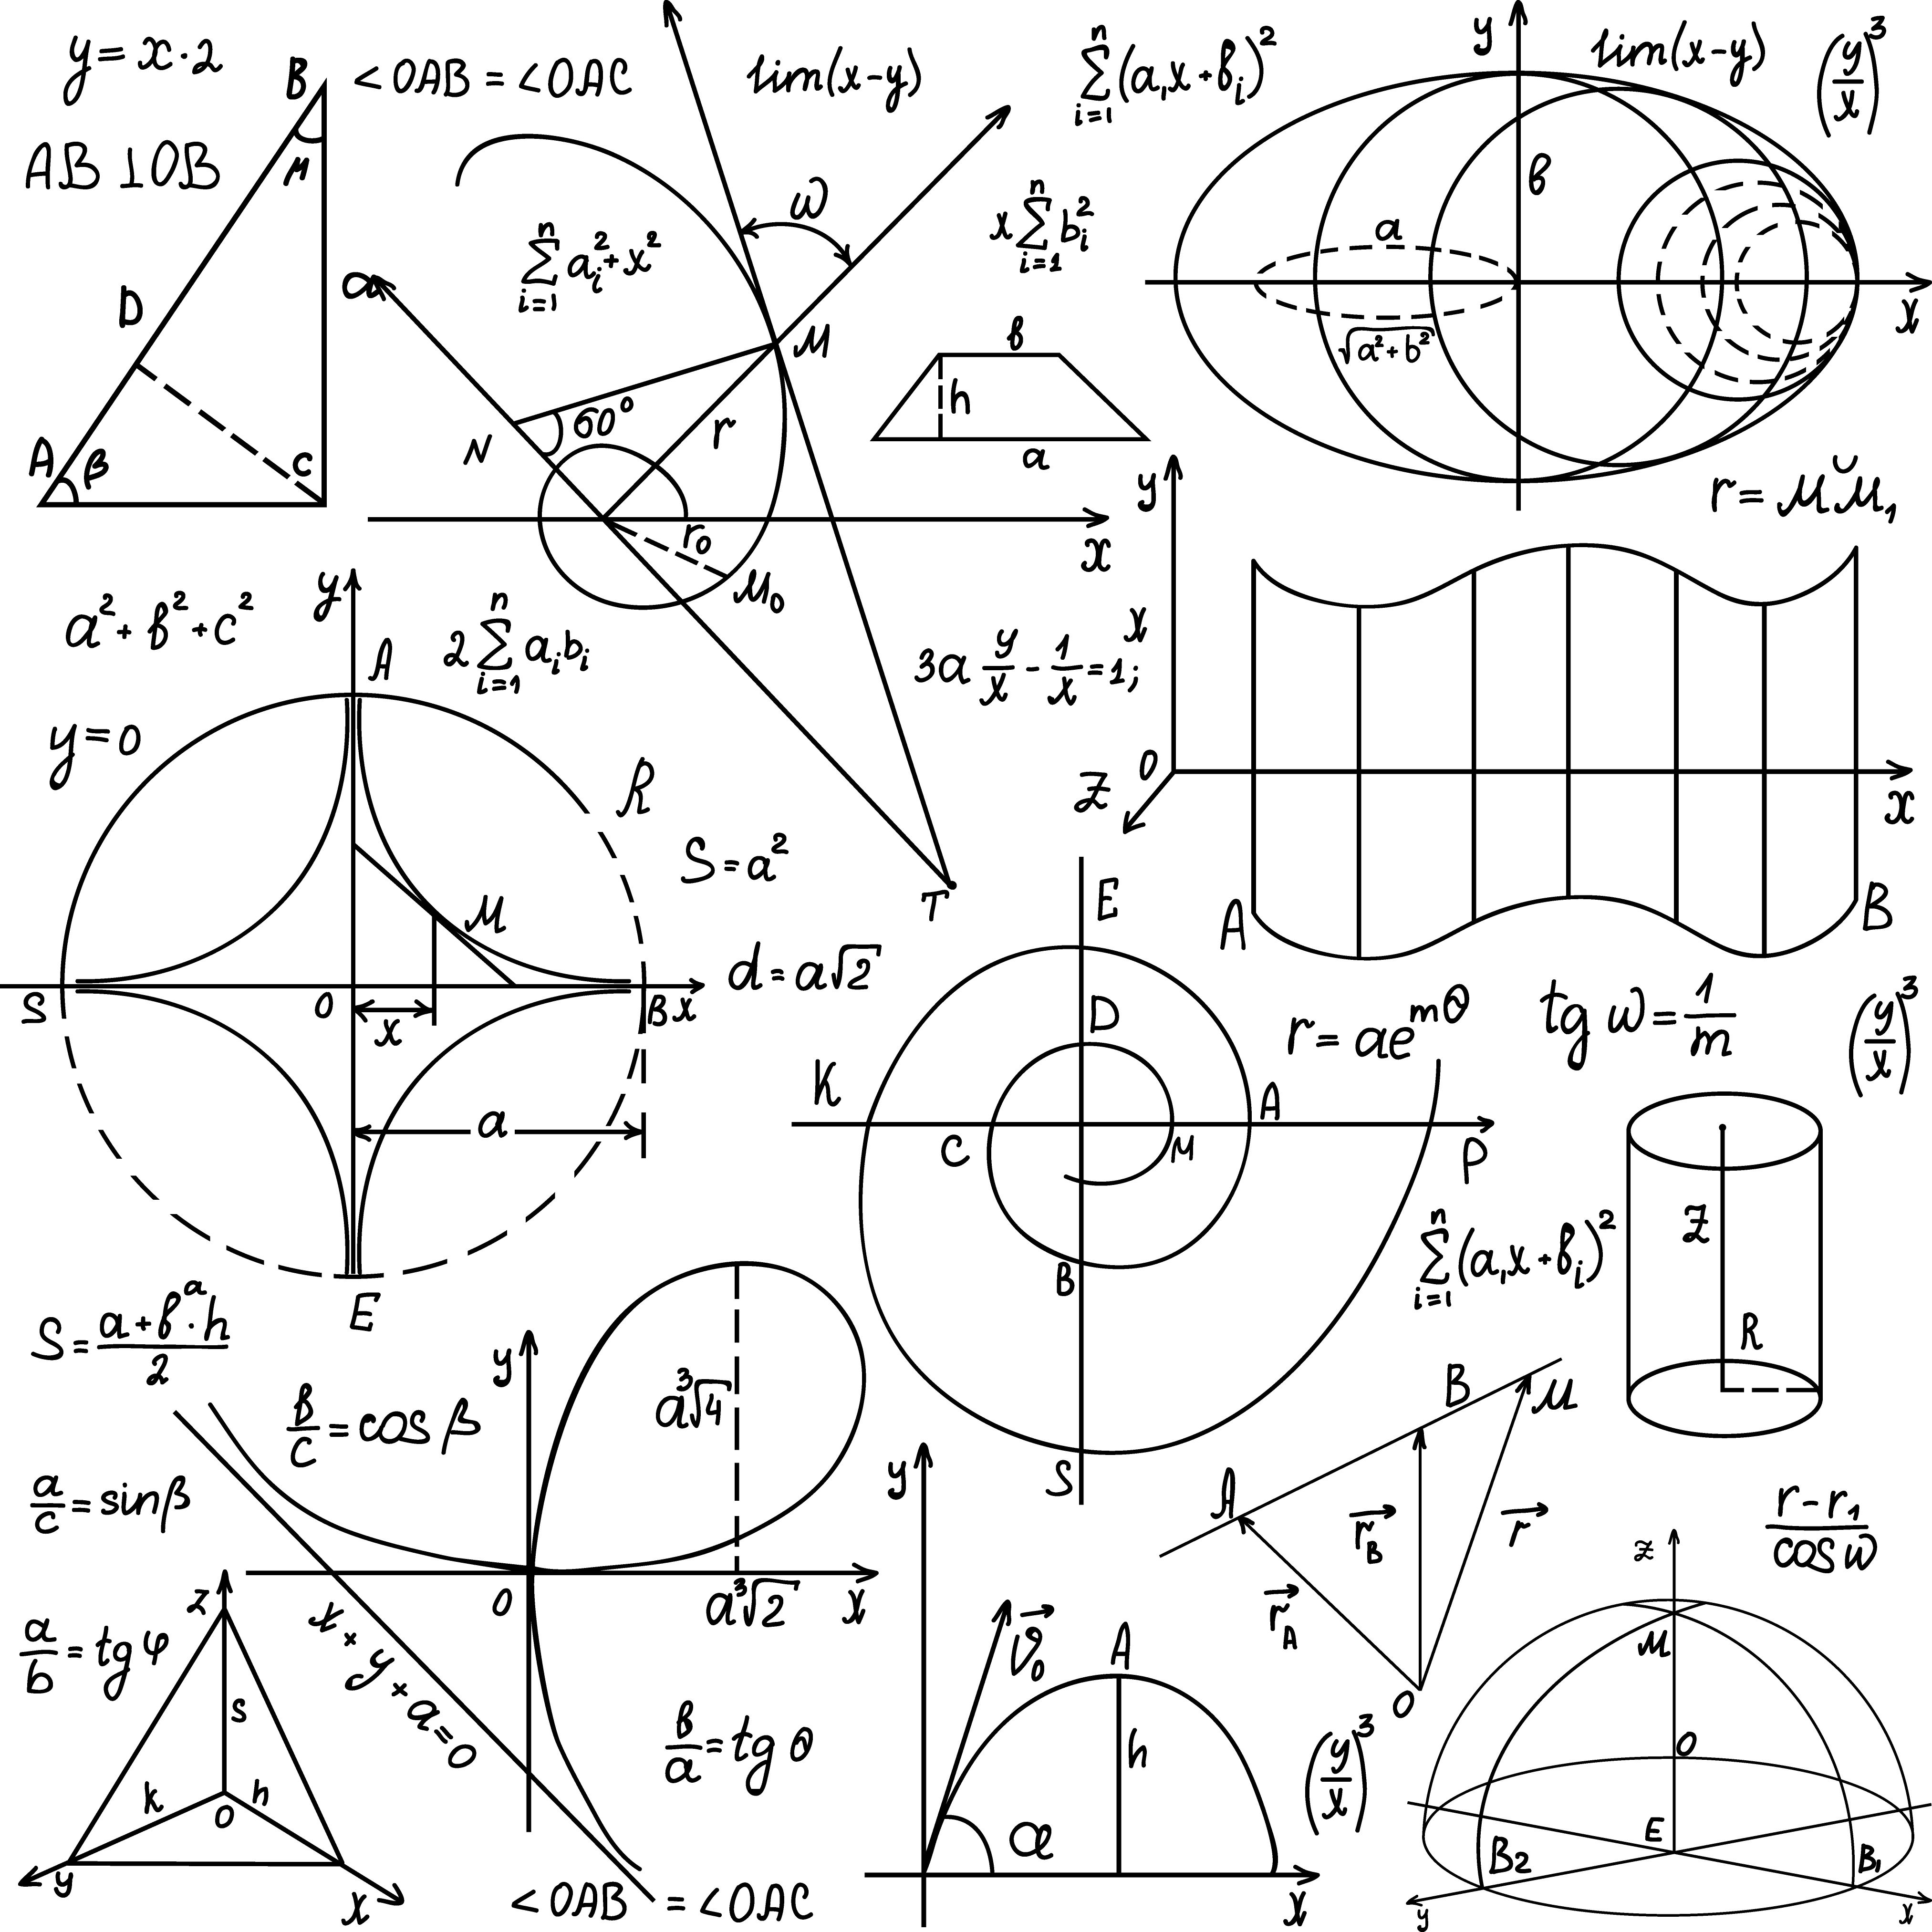 Mathematics Euclidean Vector Geometry Formula Transparent Background Math Png Transparent Cartoon Jing Fm